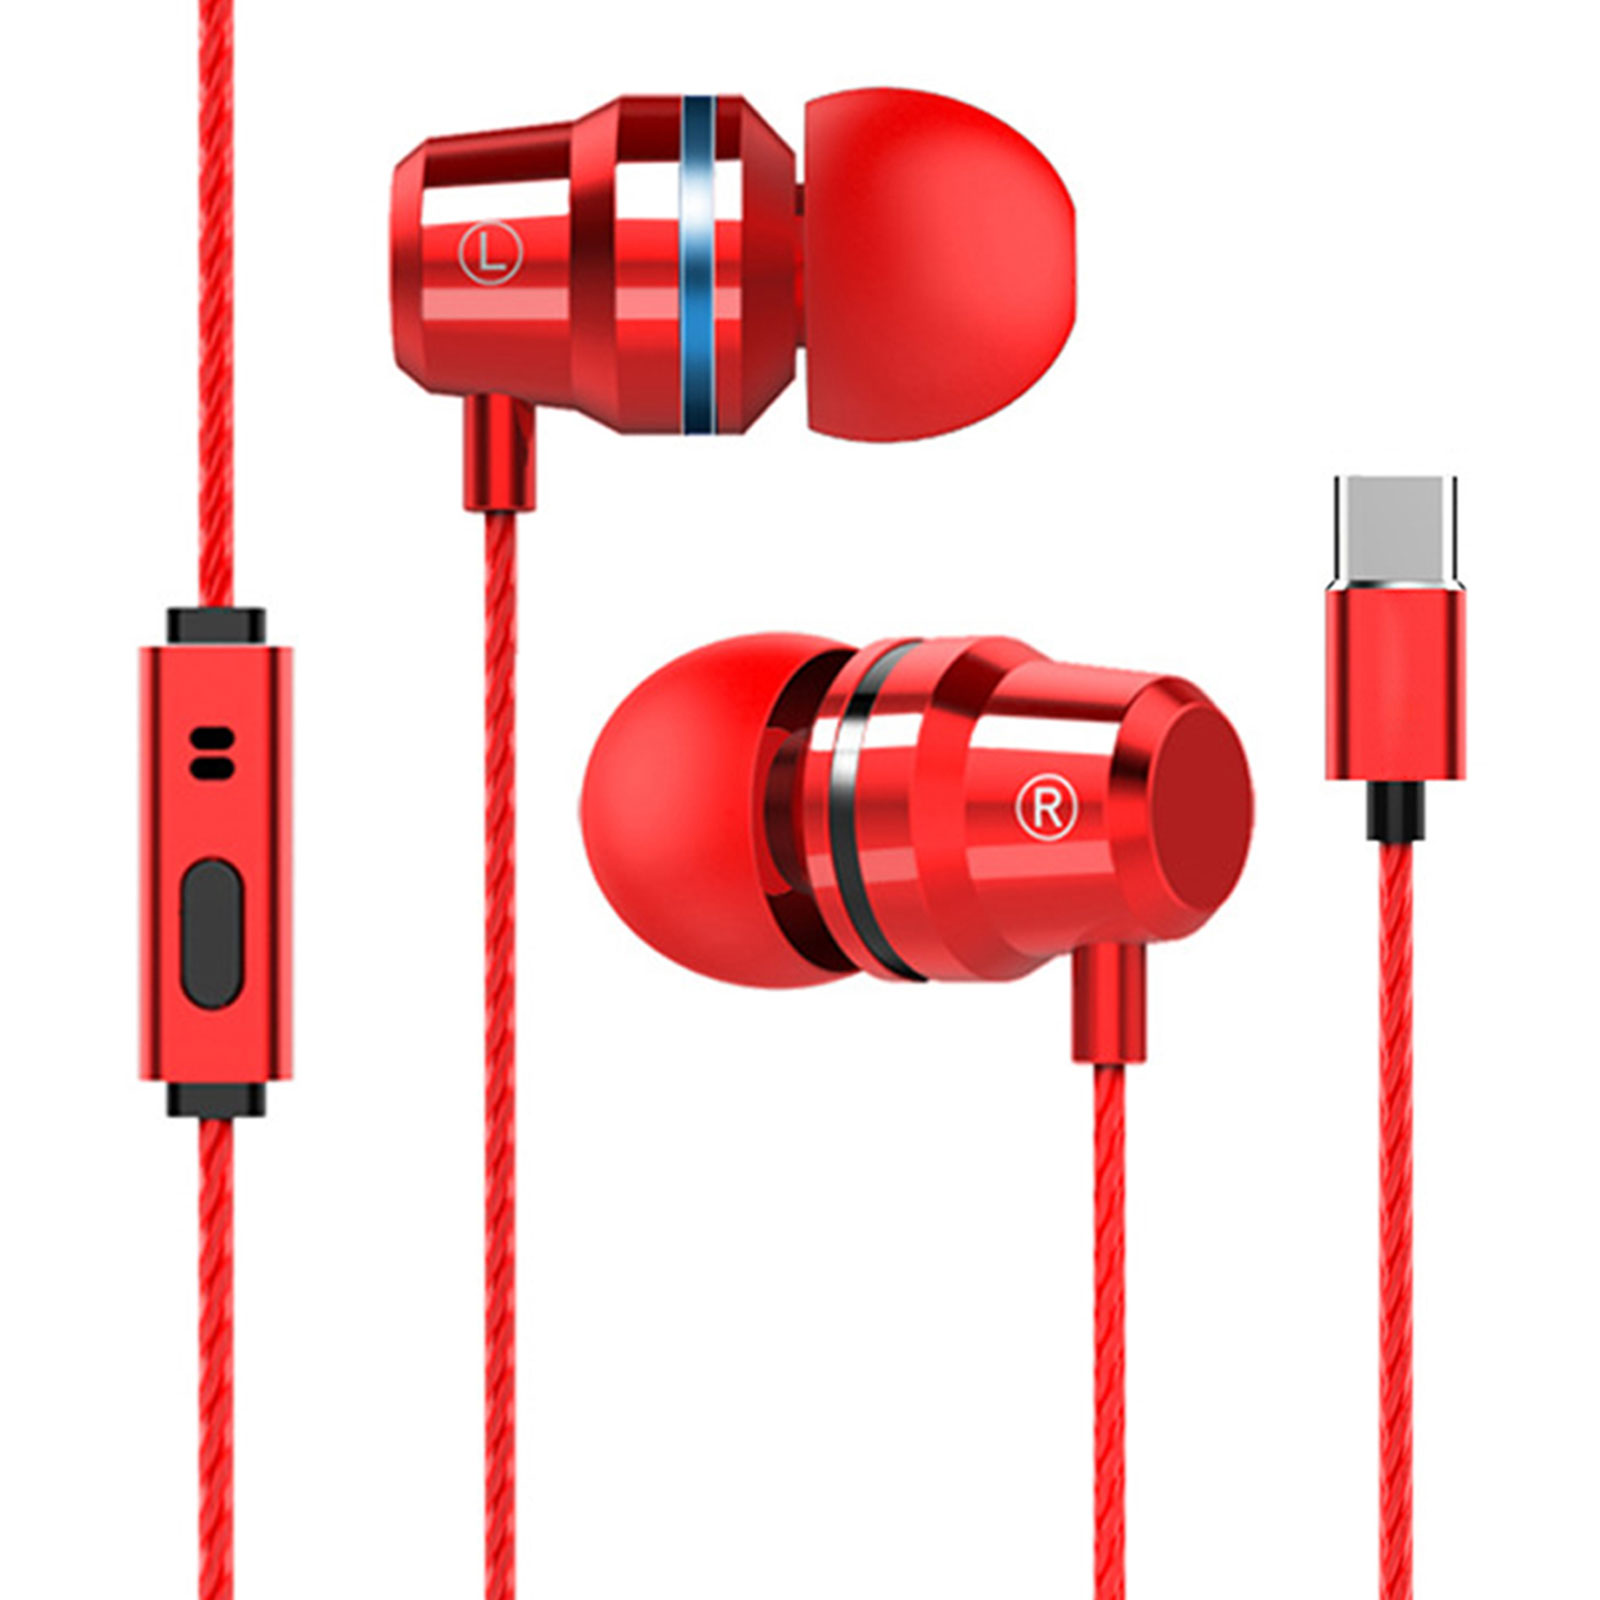 Wired In-Ear Type-C Earphone Earbuds Headphone Headset Stereo Super Bass HD Mic